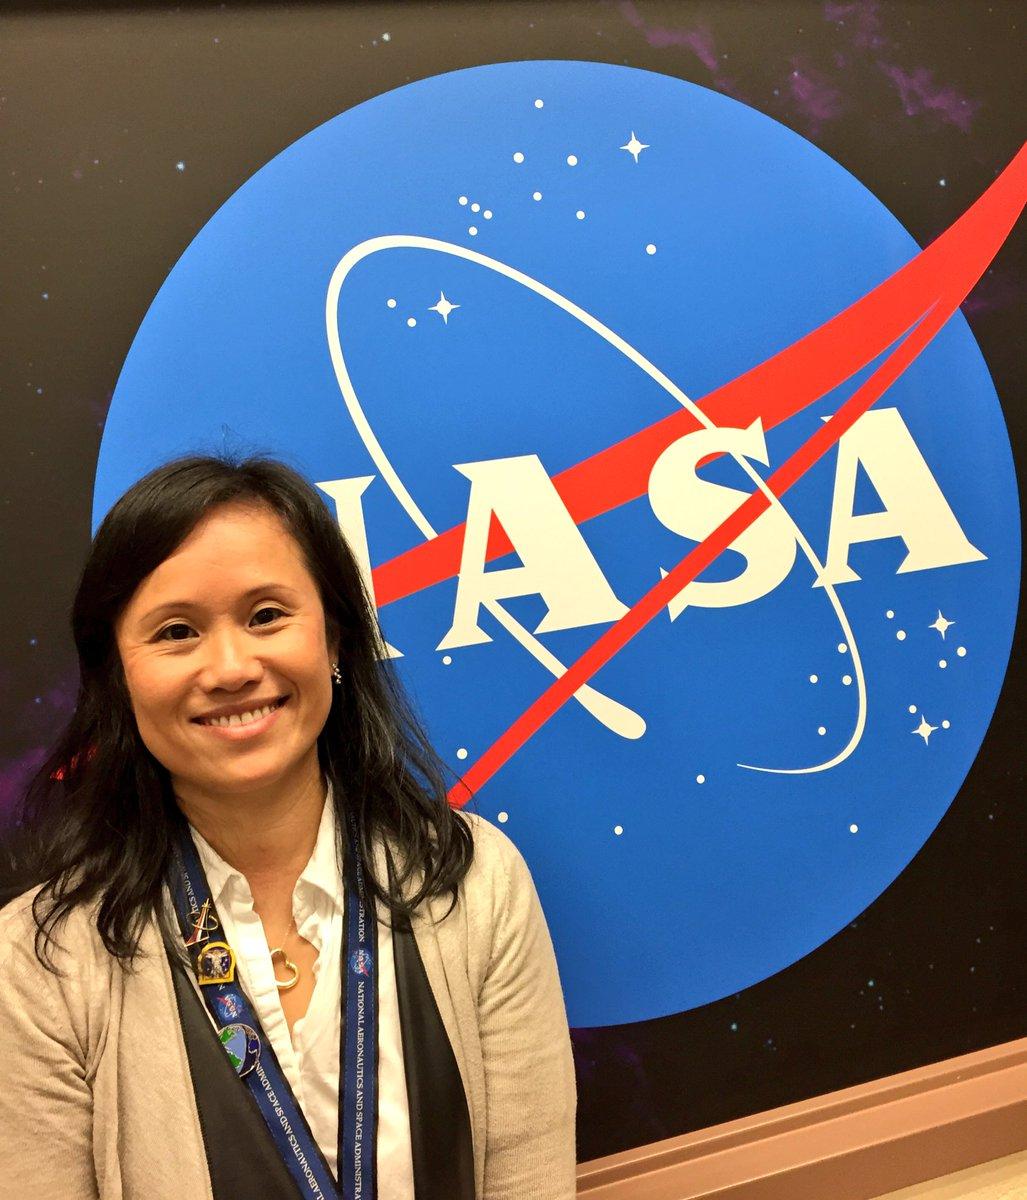 #emojiinthewild. Thanks for letting me tag along #ICESat2 #NASASocial! #bigdata #spacedata #NASADatanauts @NASASocial<br>http://pic.twitter.com/LVnYBOQJzv